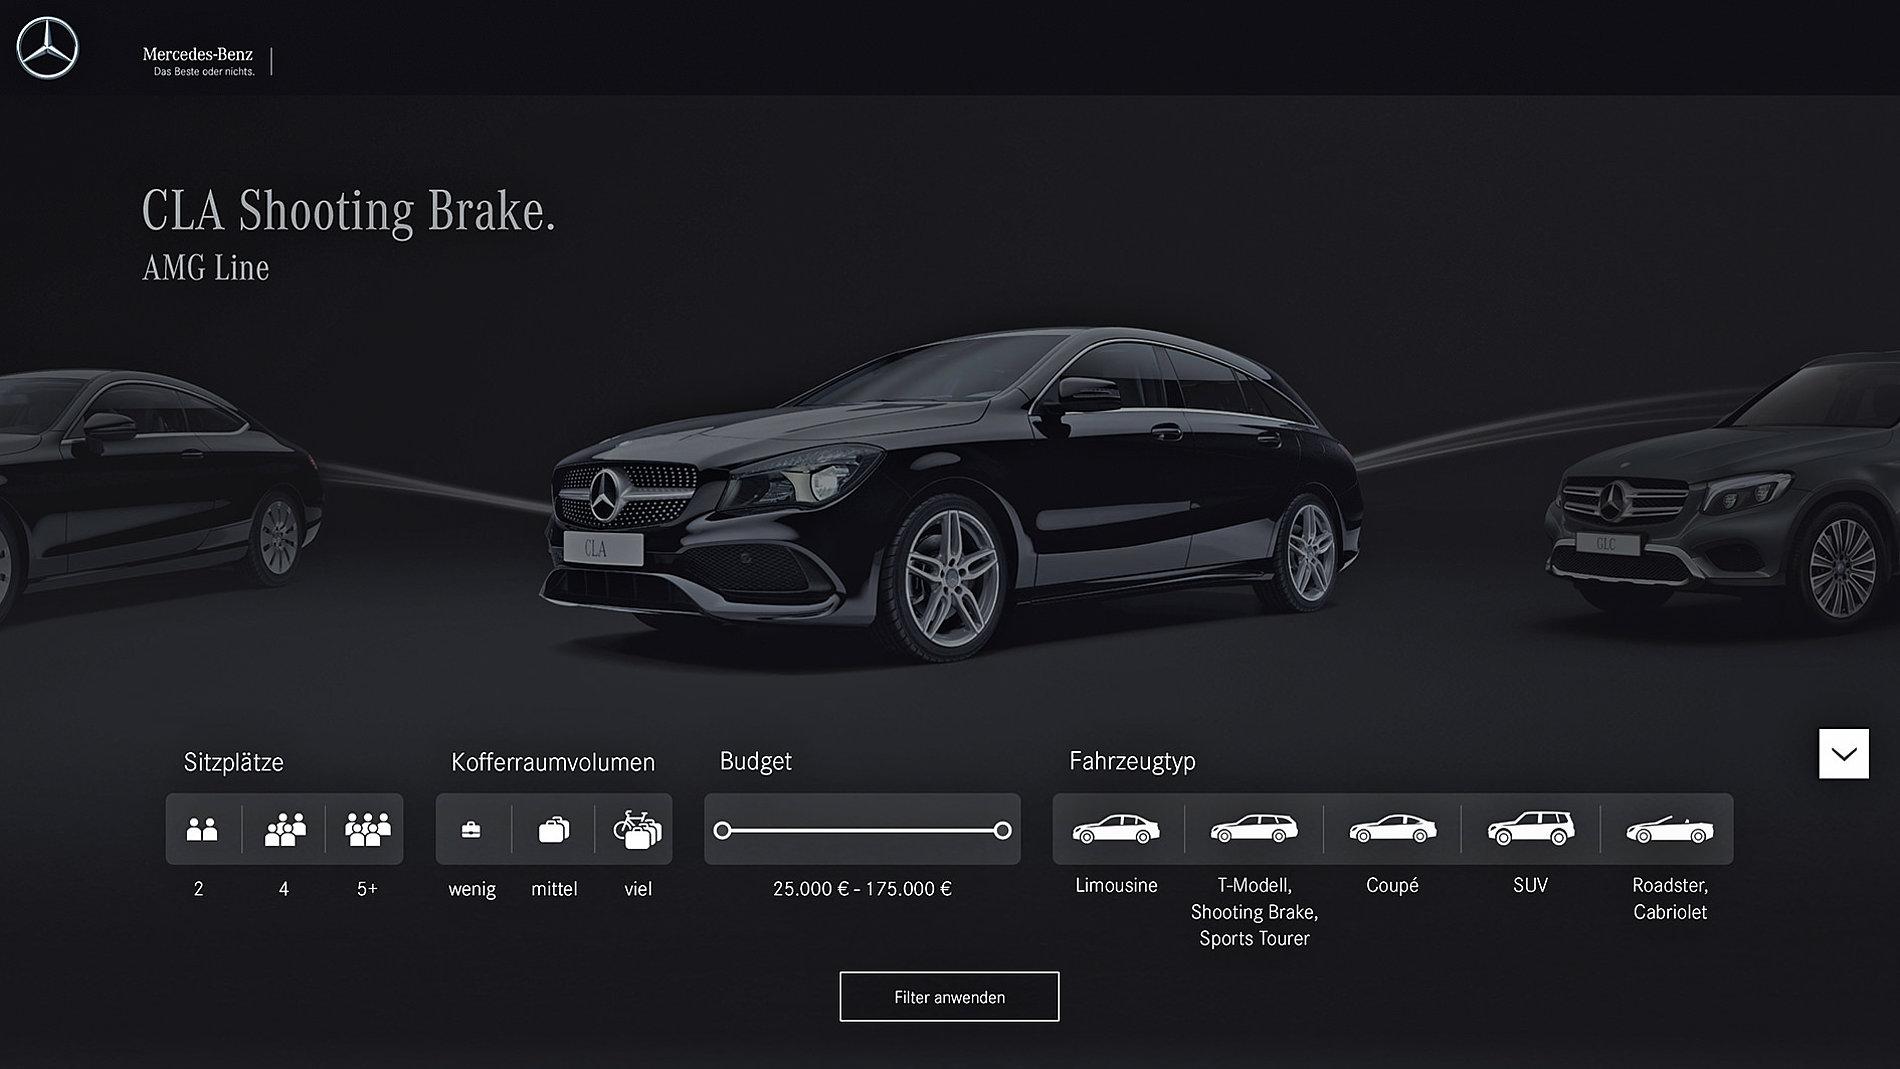 Mercedes-Benz  Lifestyle Configurator | Red Dot Design Award